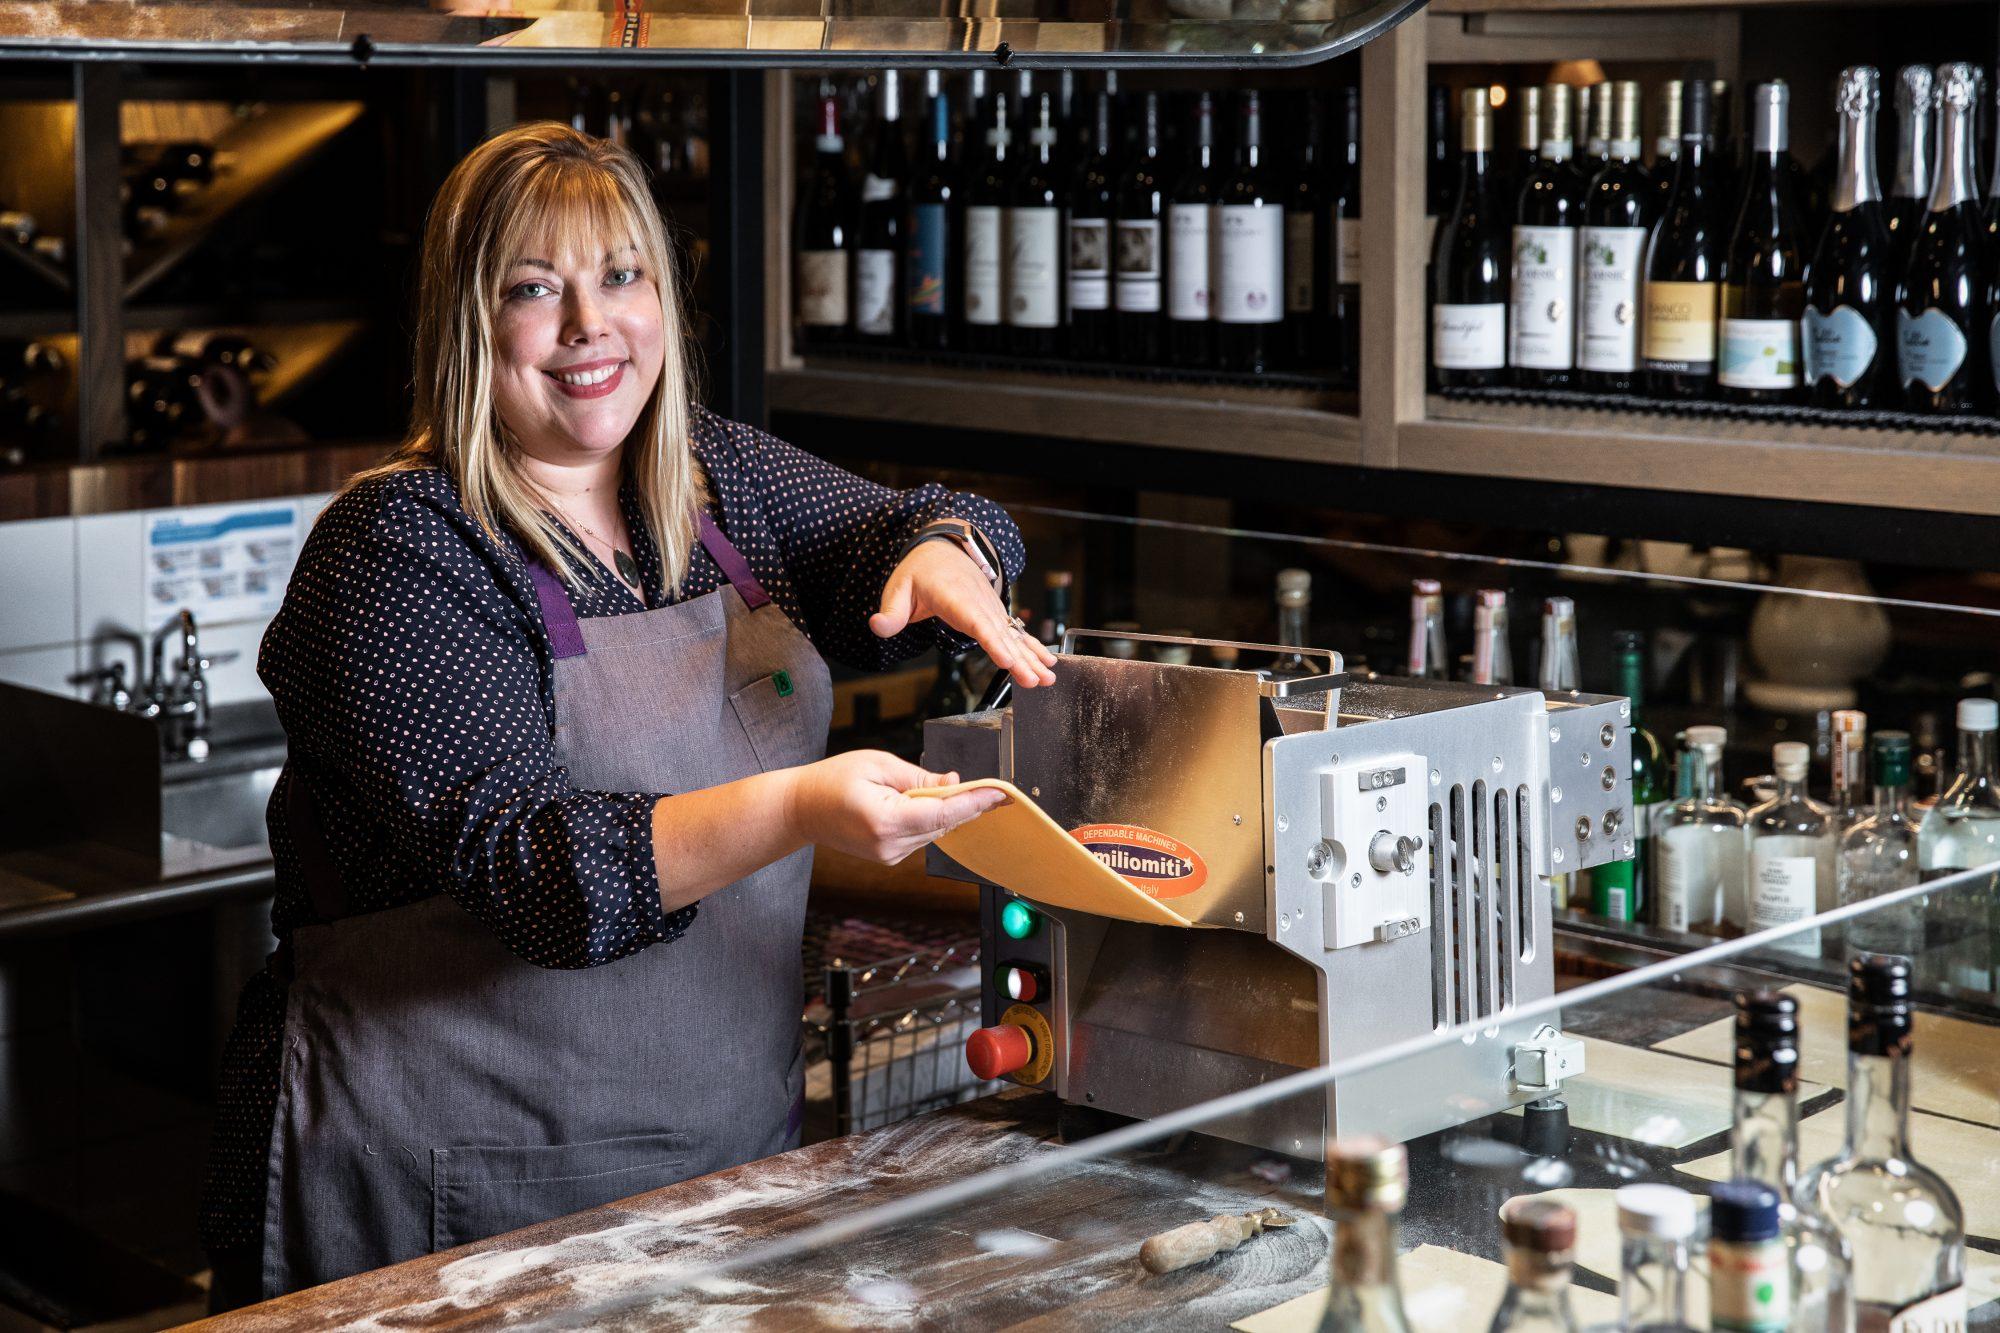 Sarah Grueneberg, chef and partner at Monteverde Pastificio in Chicago